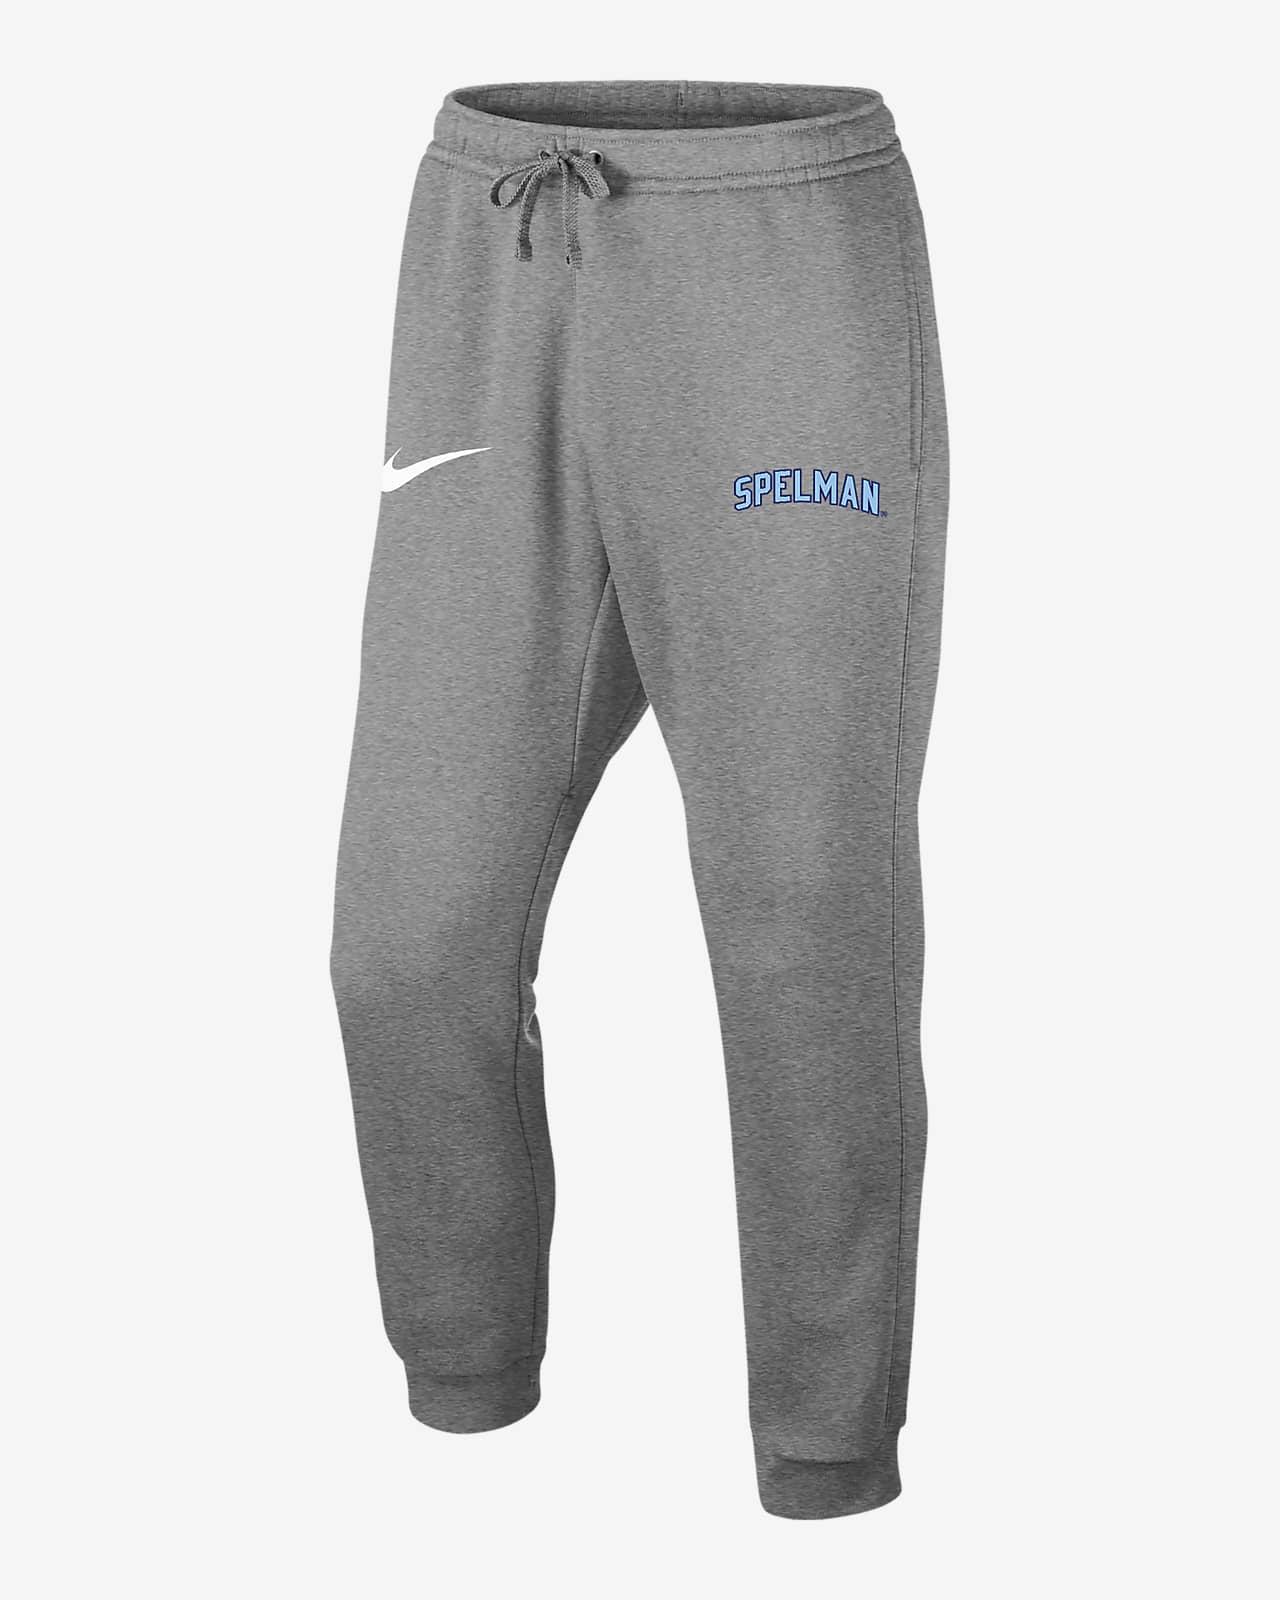 Nike College Club Fleece (Spelman) Joggers